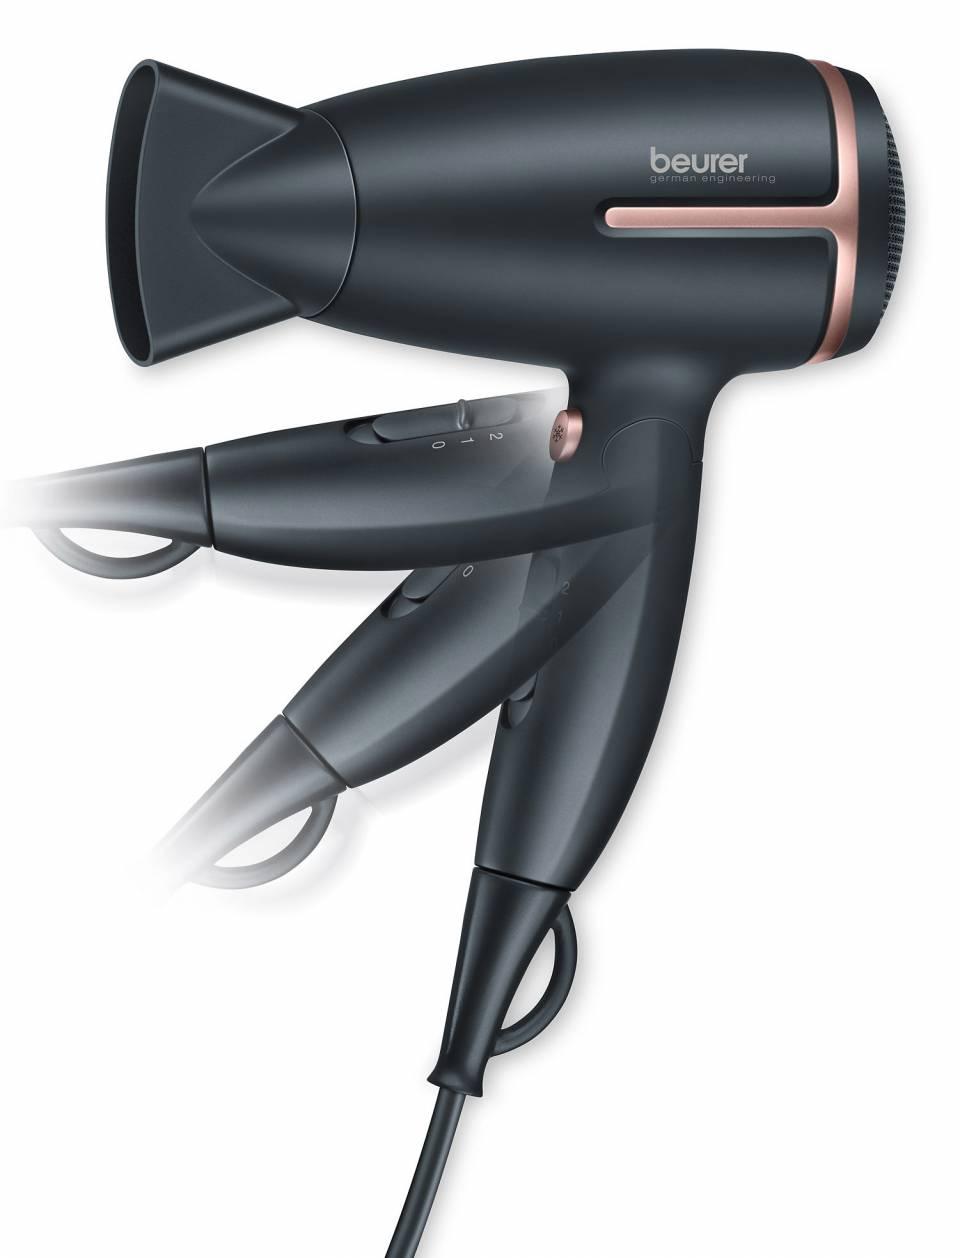 Beurer Haartrockner StylePro HC 25 ist ein Reisehaartrockner.